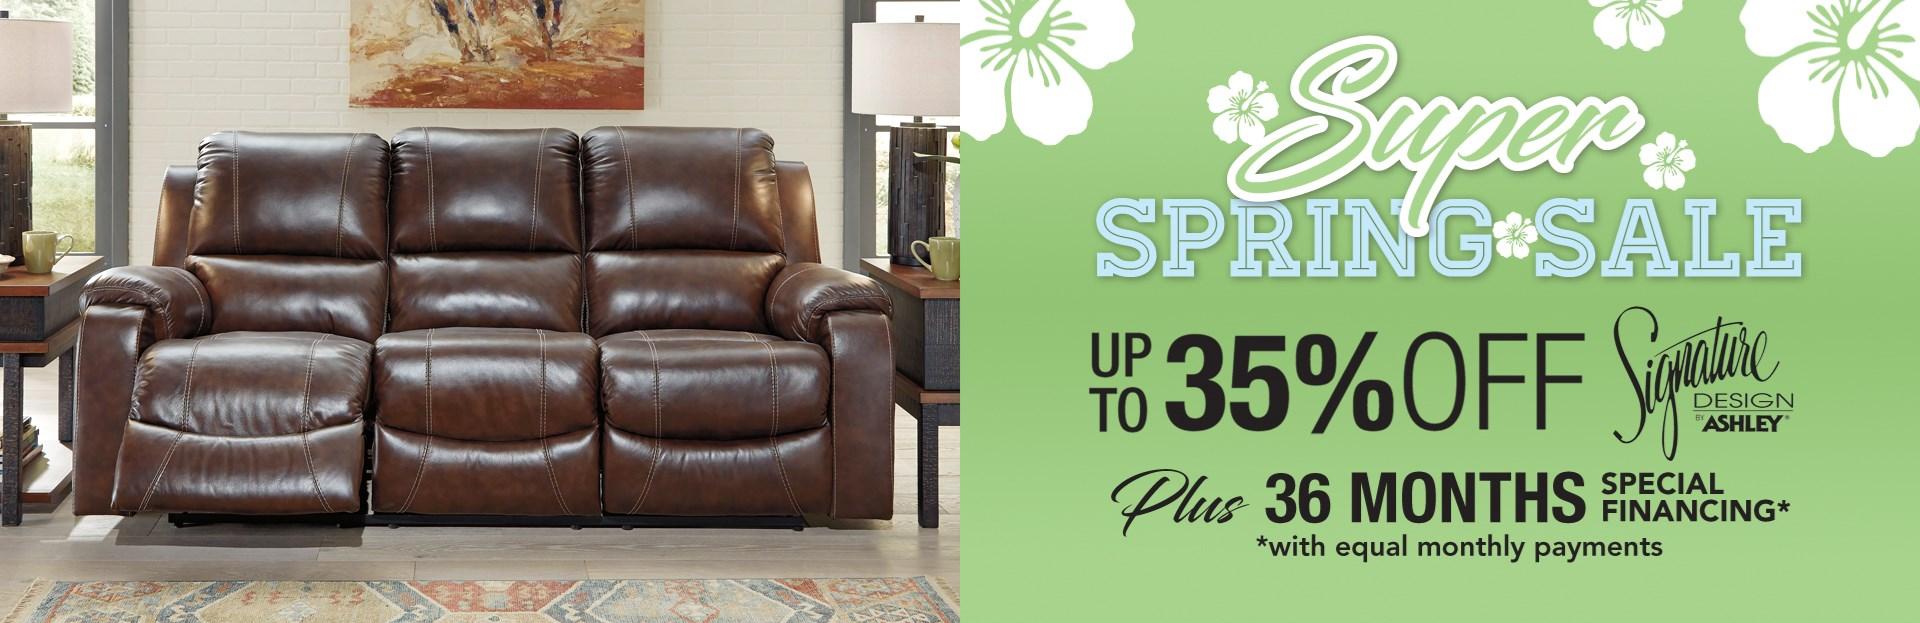 Super Spring Savings